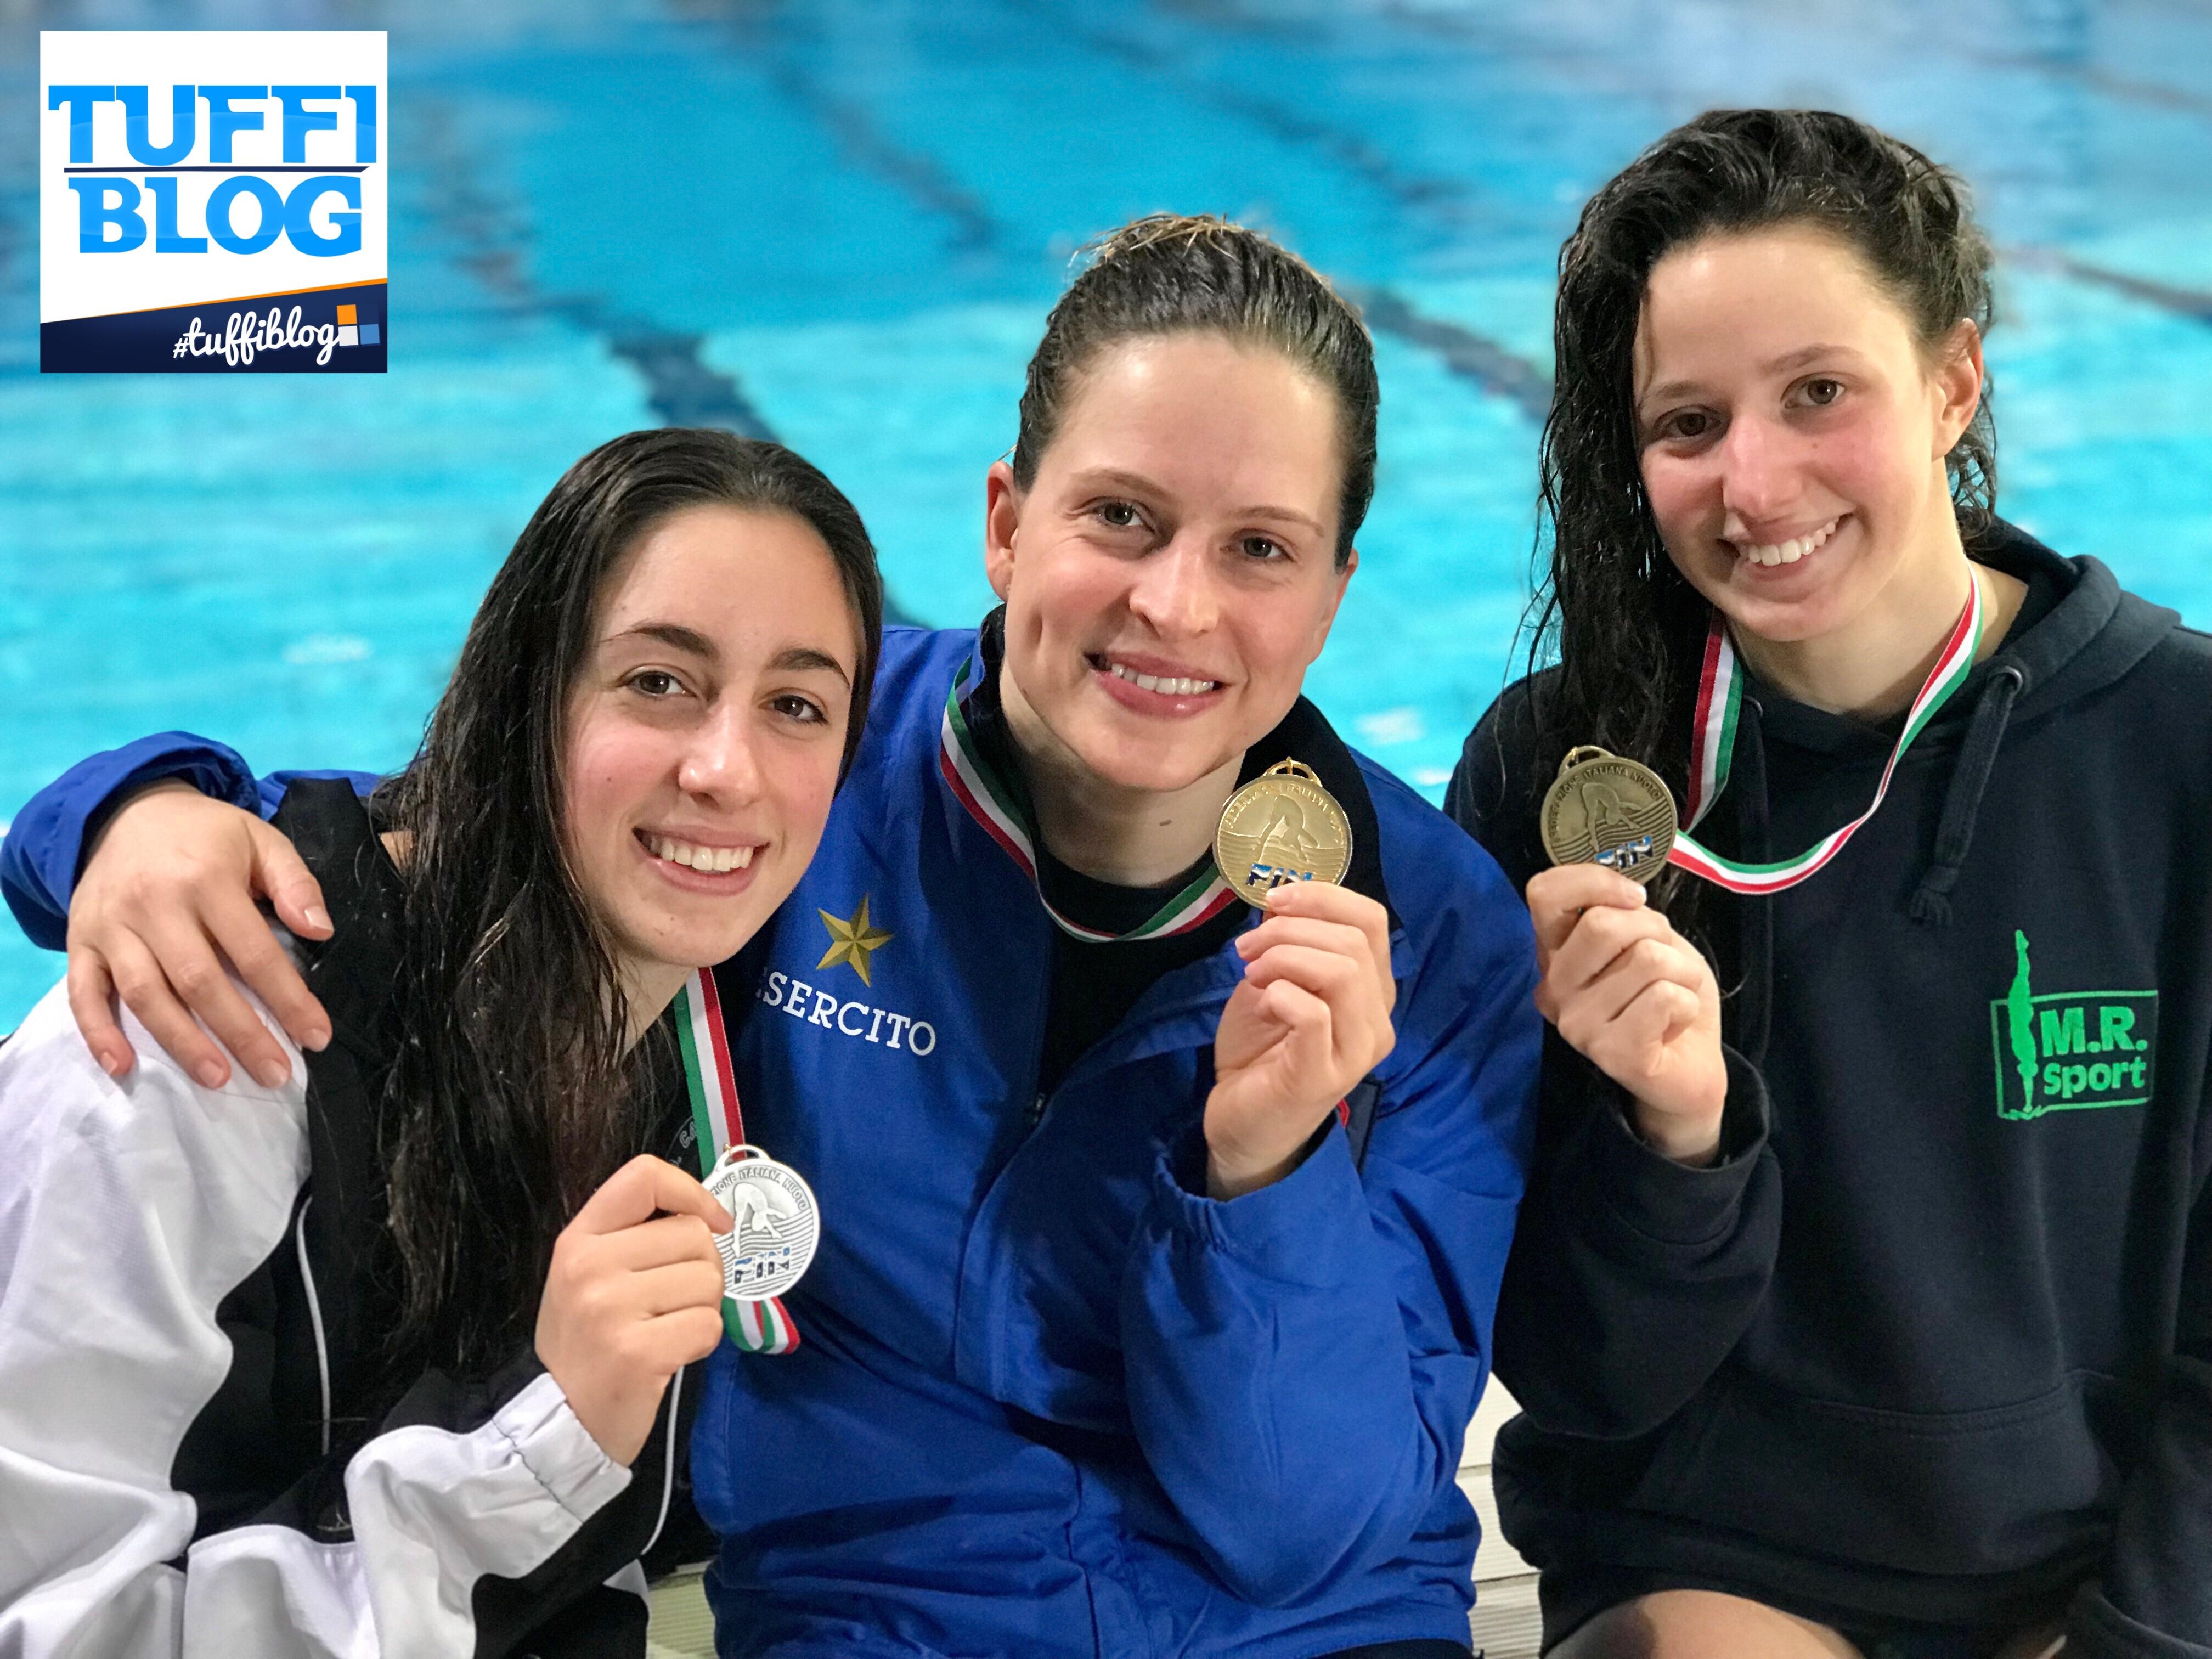 Campionati di Categoria Indoor: Trieste - Ultimo giorno, ultime medaglie!